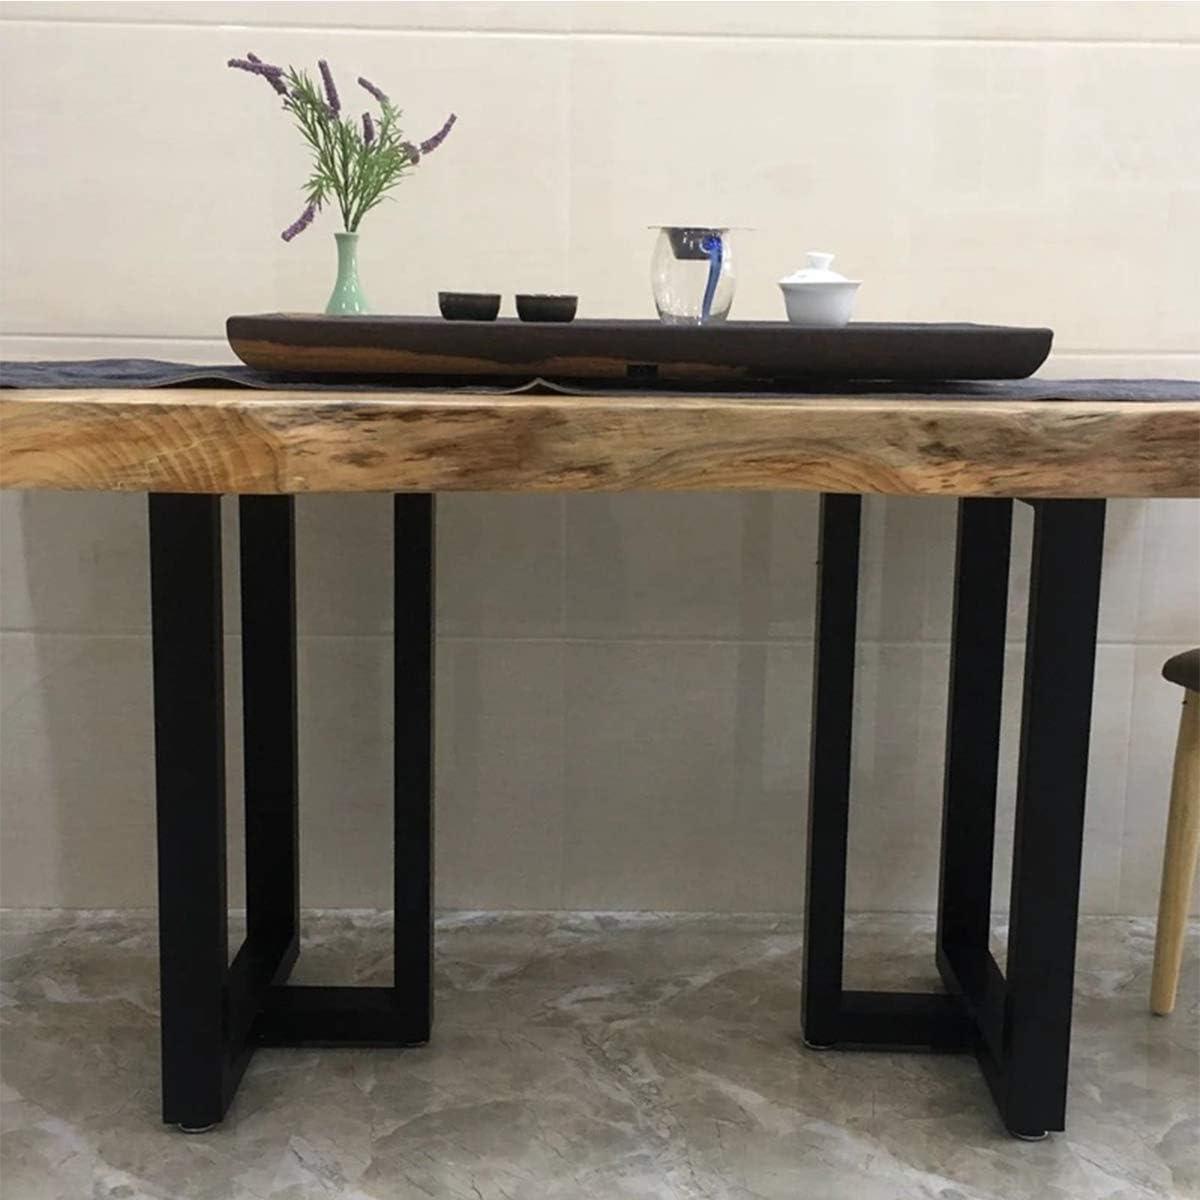 "MDEPYCO 2 Pack Industrial Rustic Furniture Legs 28"" H x 17.7"" W Decory T Shape Table Legs,Heavy Duty Metal Desk Legs,Dining Table Legs, DIY Brackets Bench Legs(Only Legs Without Board, Black)"